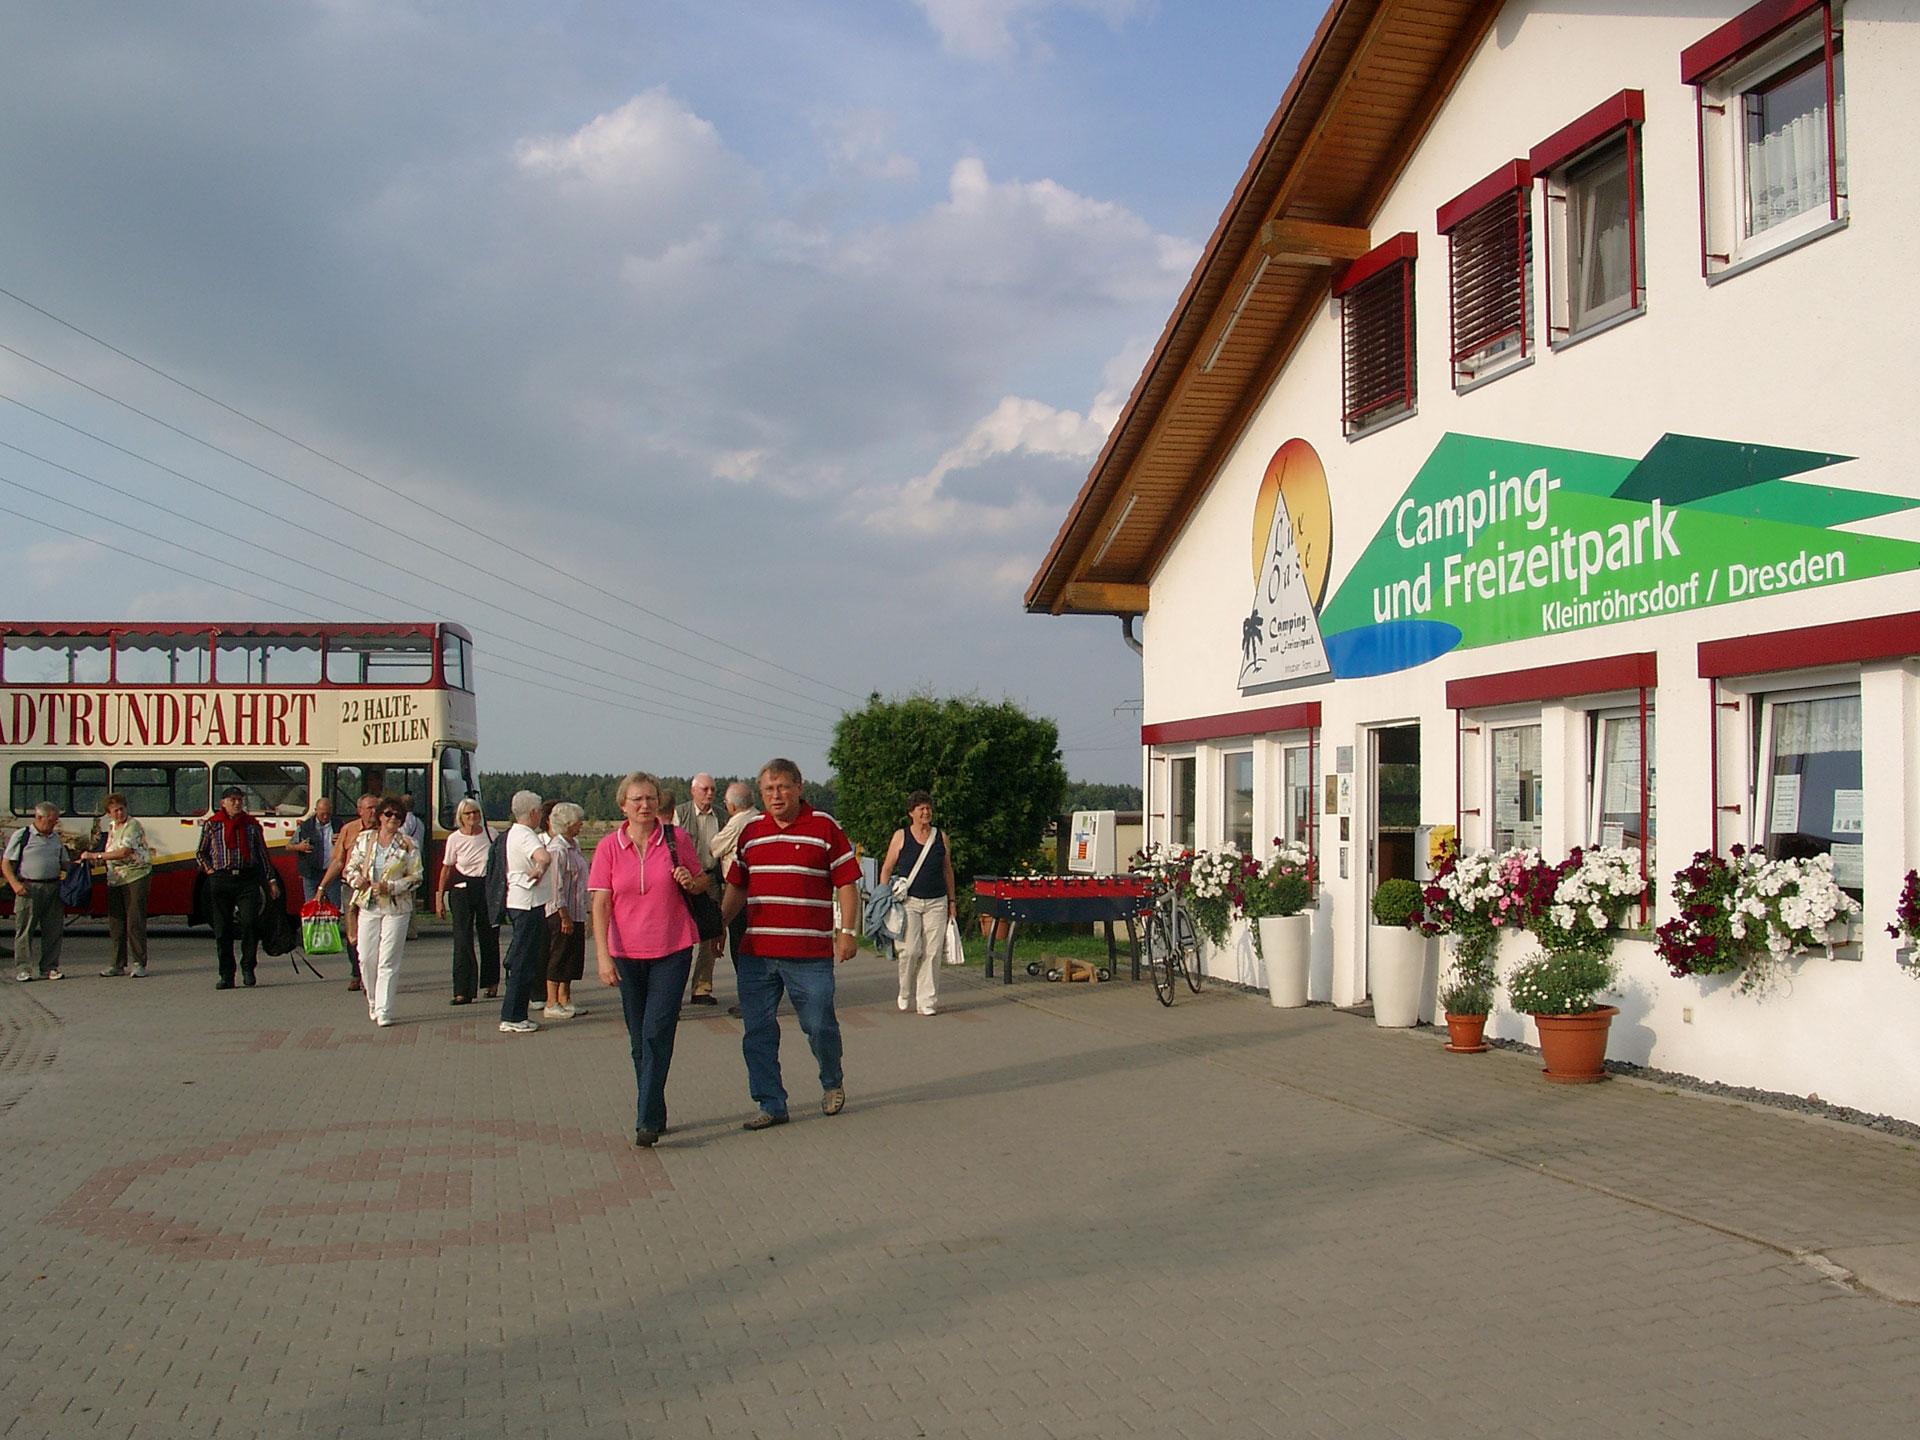 cb6a1c17937d07 c5g Stellplatz-Wohnmobil.jpg c5g stadtrundfahrtvomplatz.jpg ...